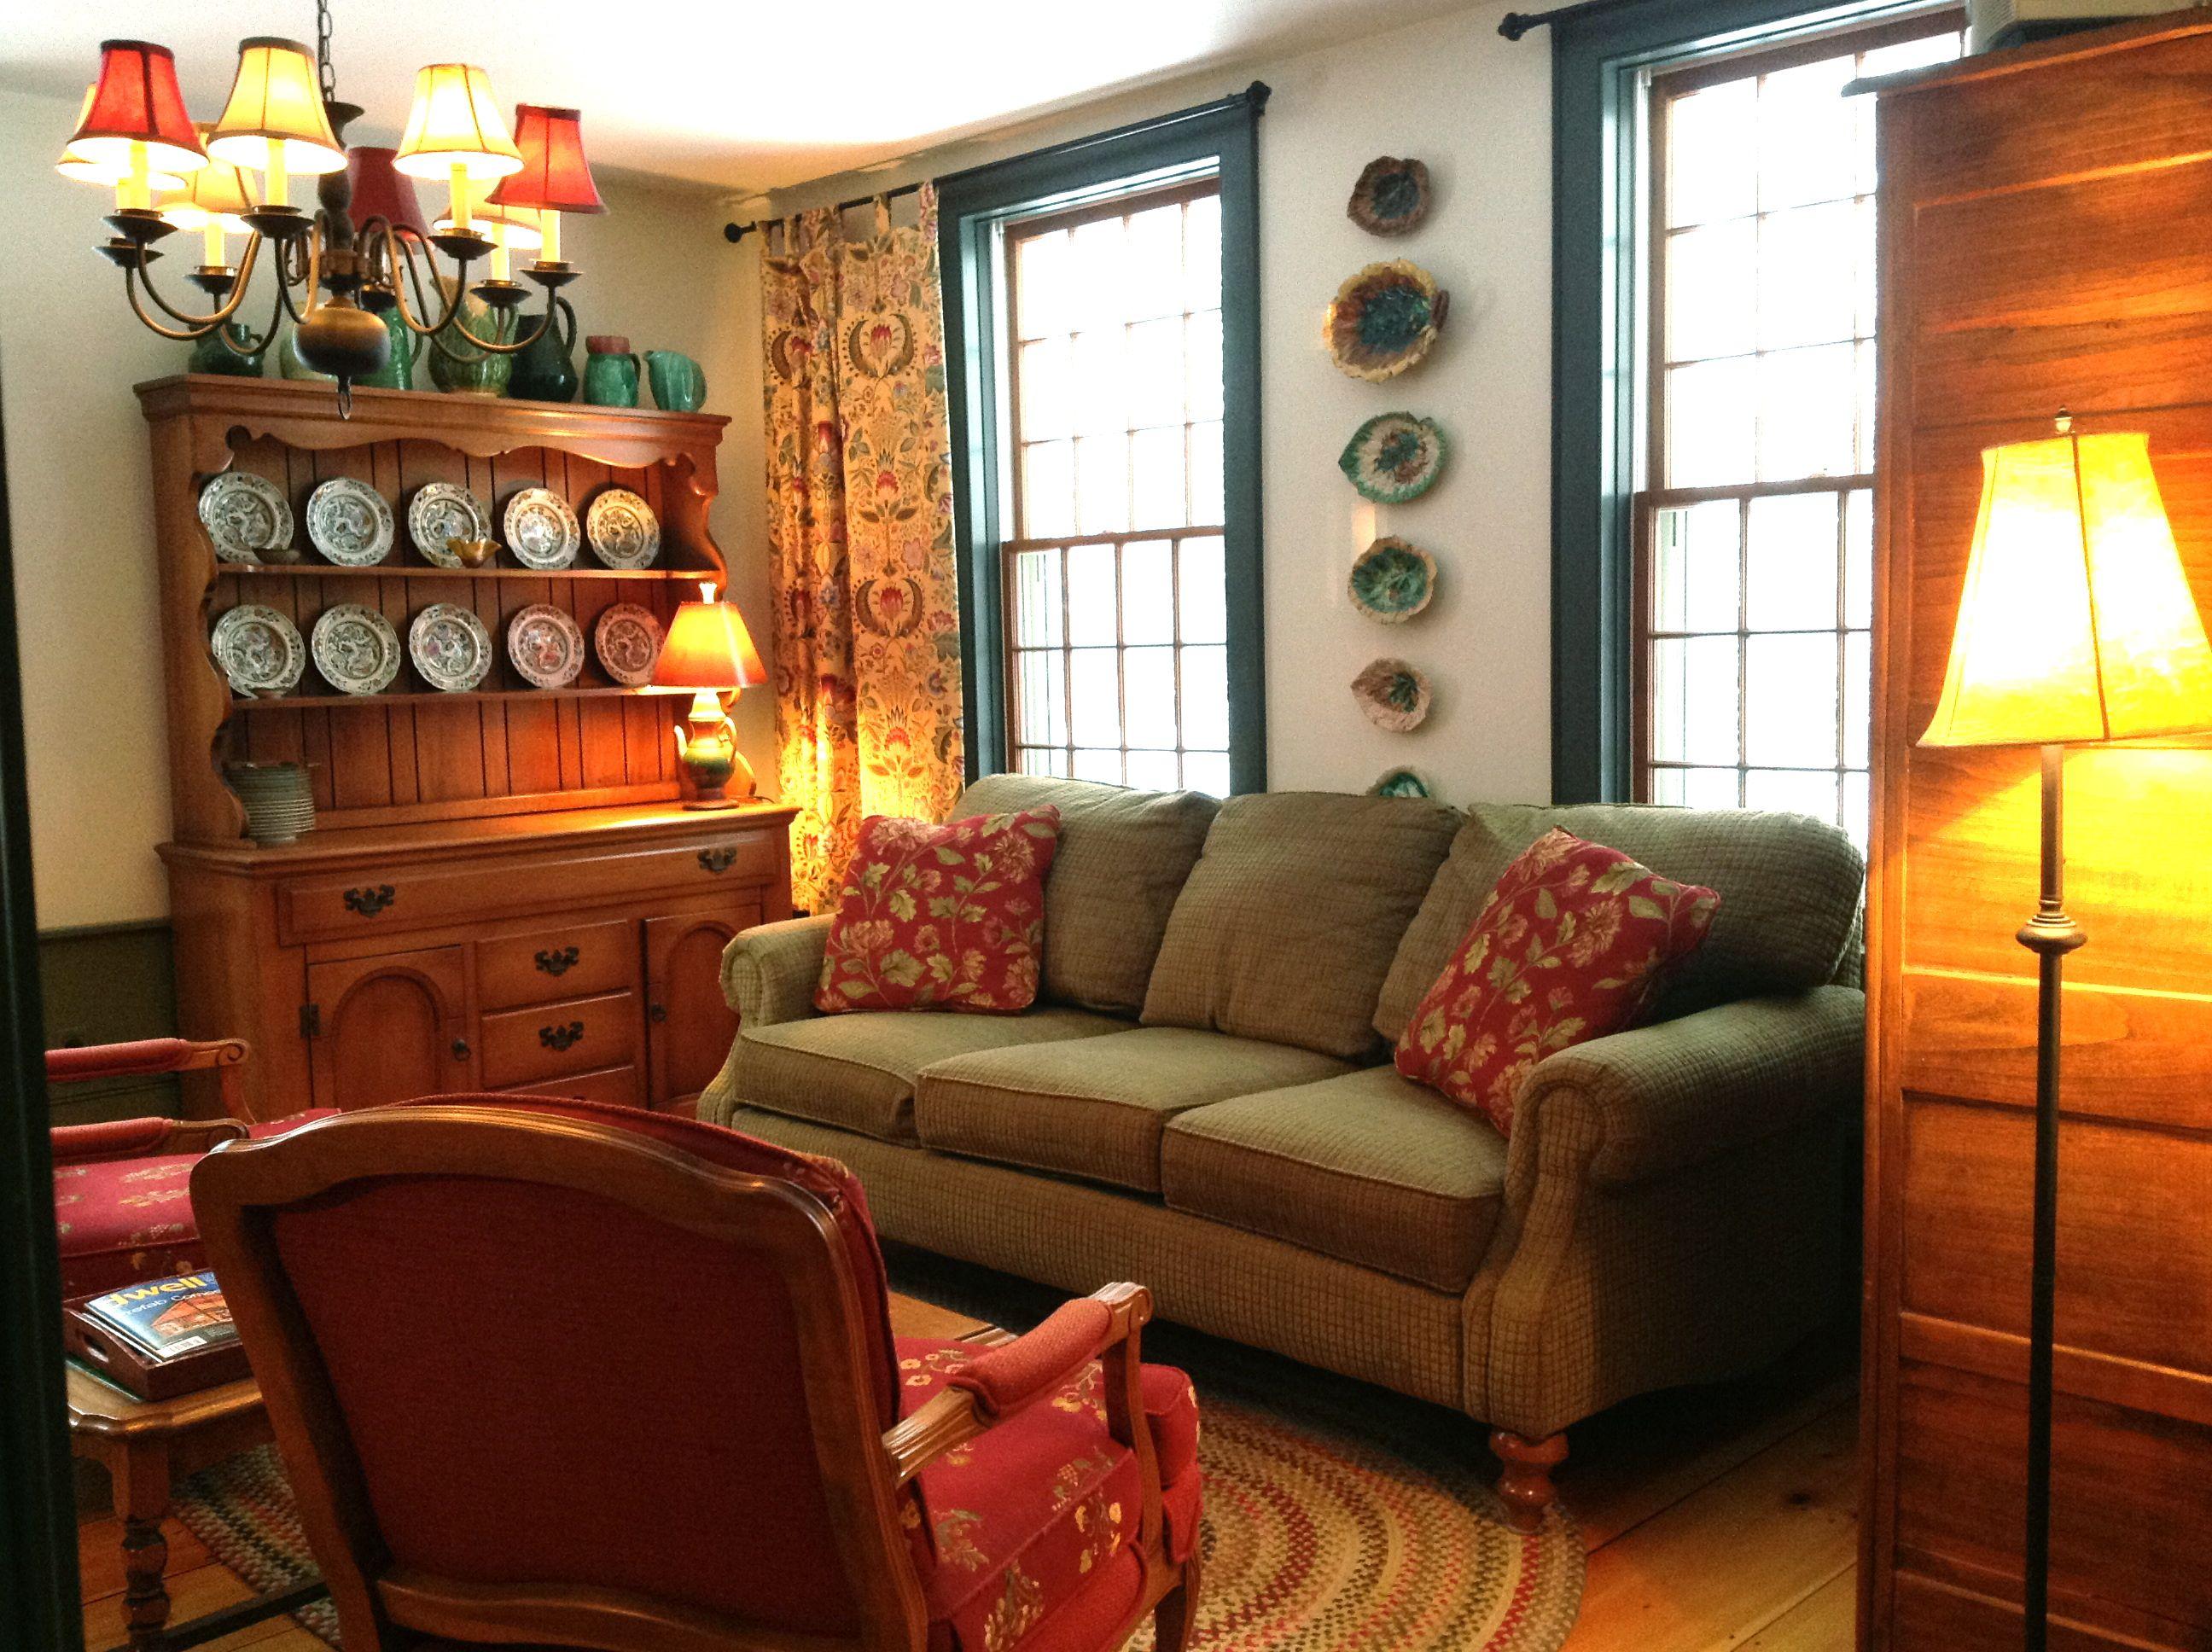 Turning dining room into sitting room dining room off - Turning a living room into a dining room ...